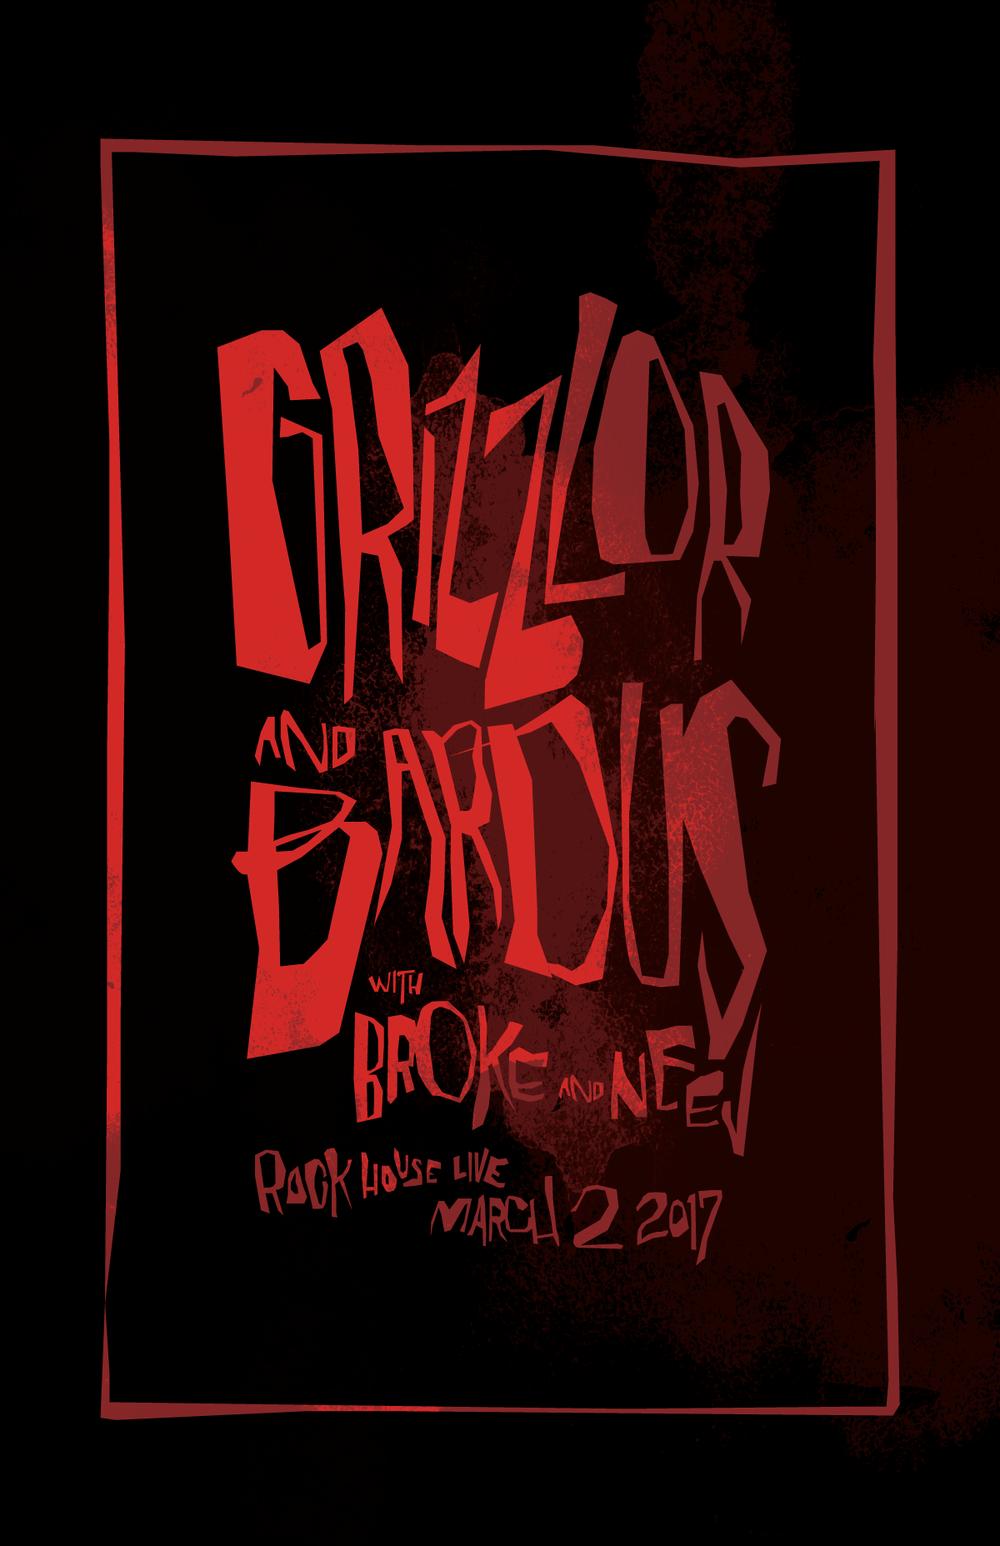 GRIZZLOR • BARDUS • BROKE